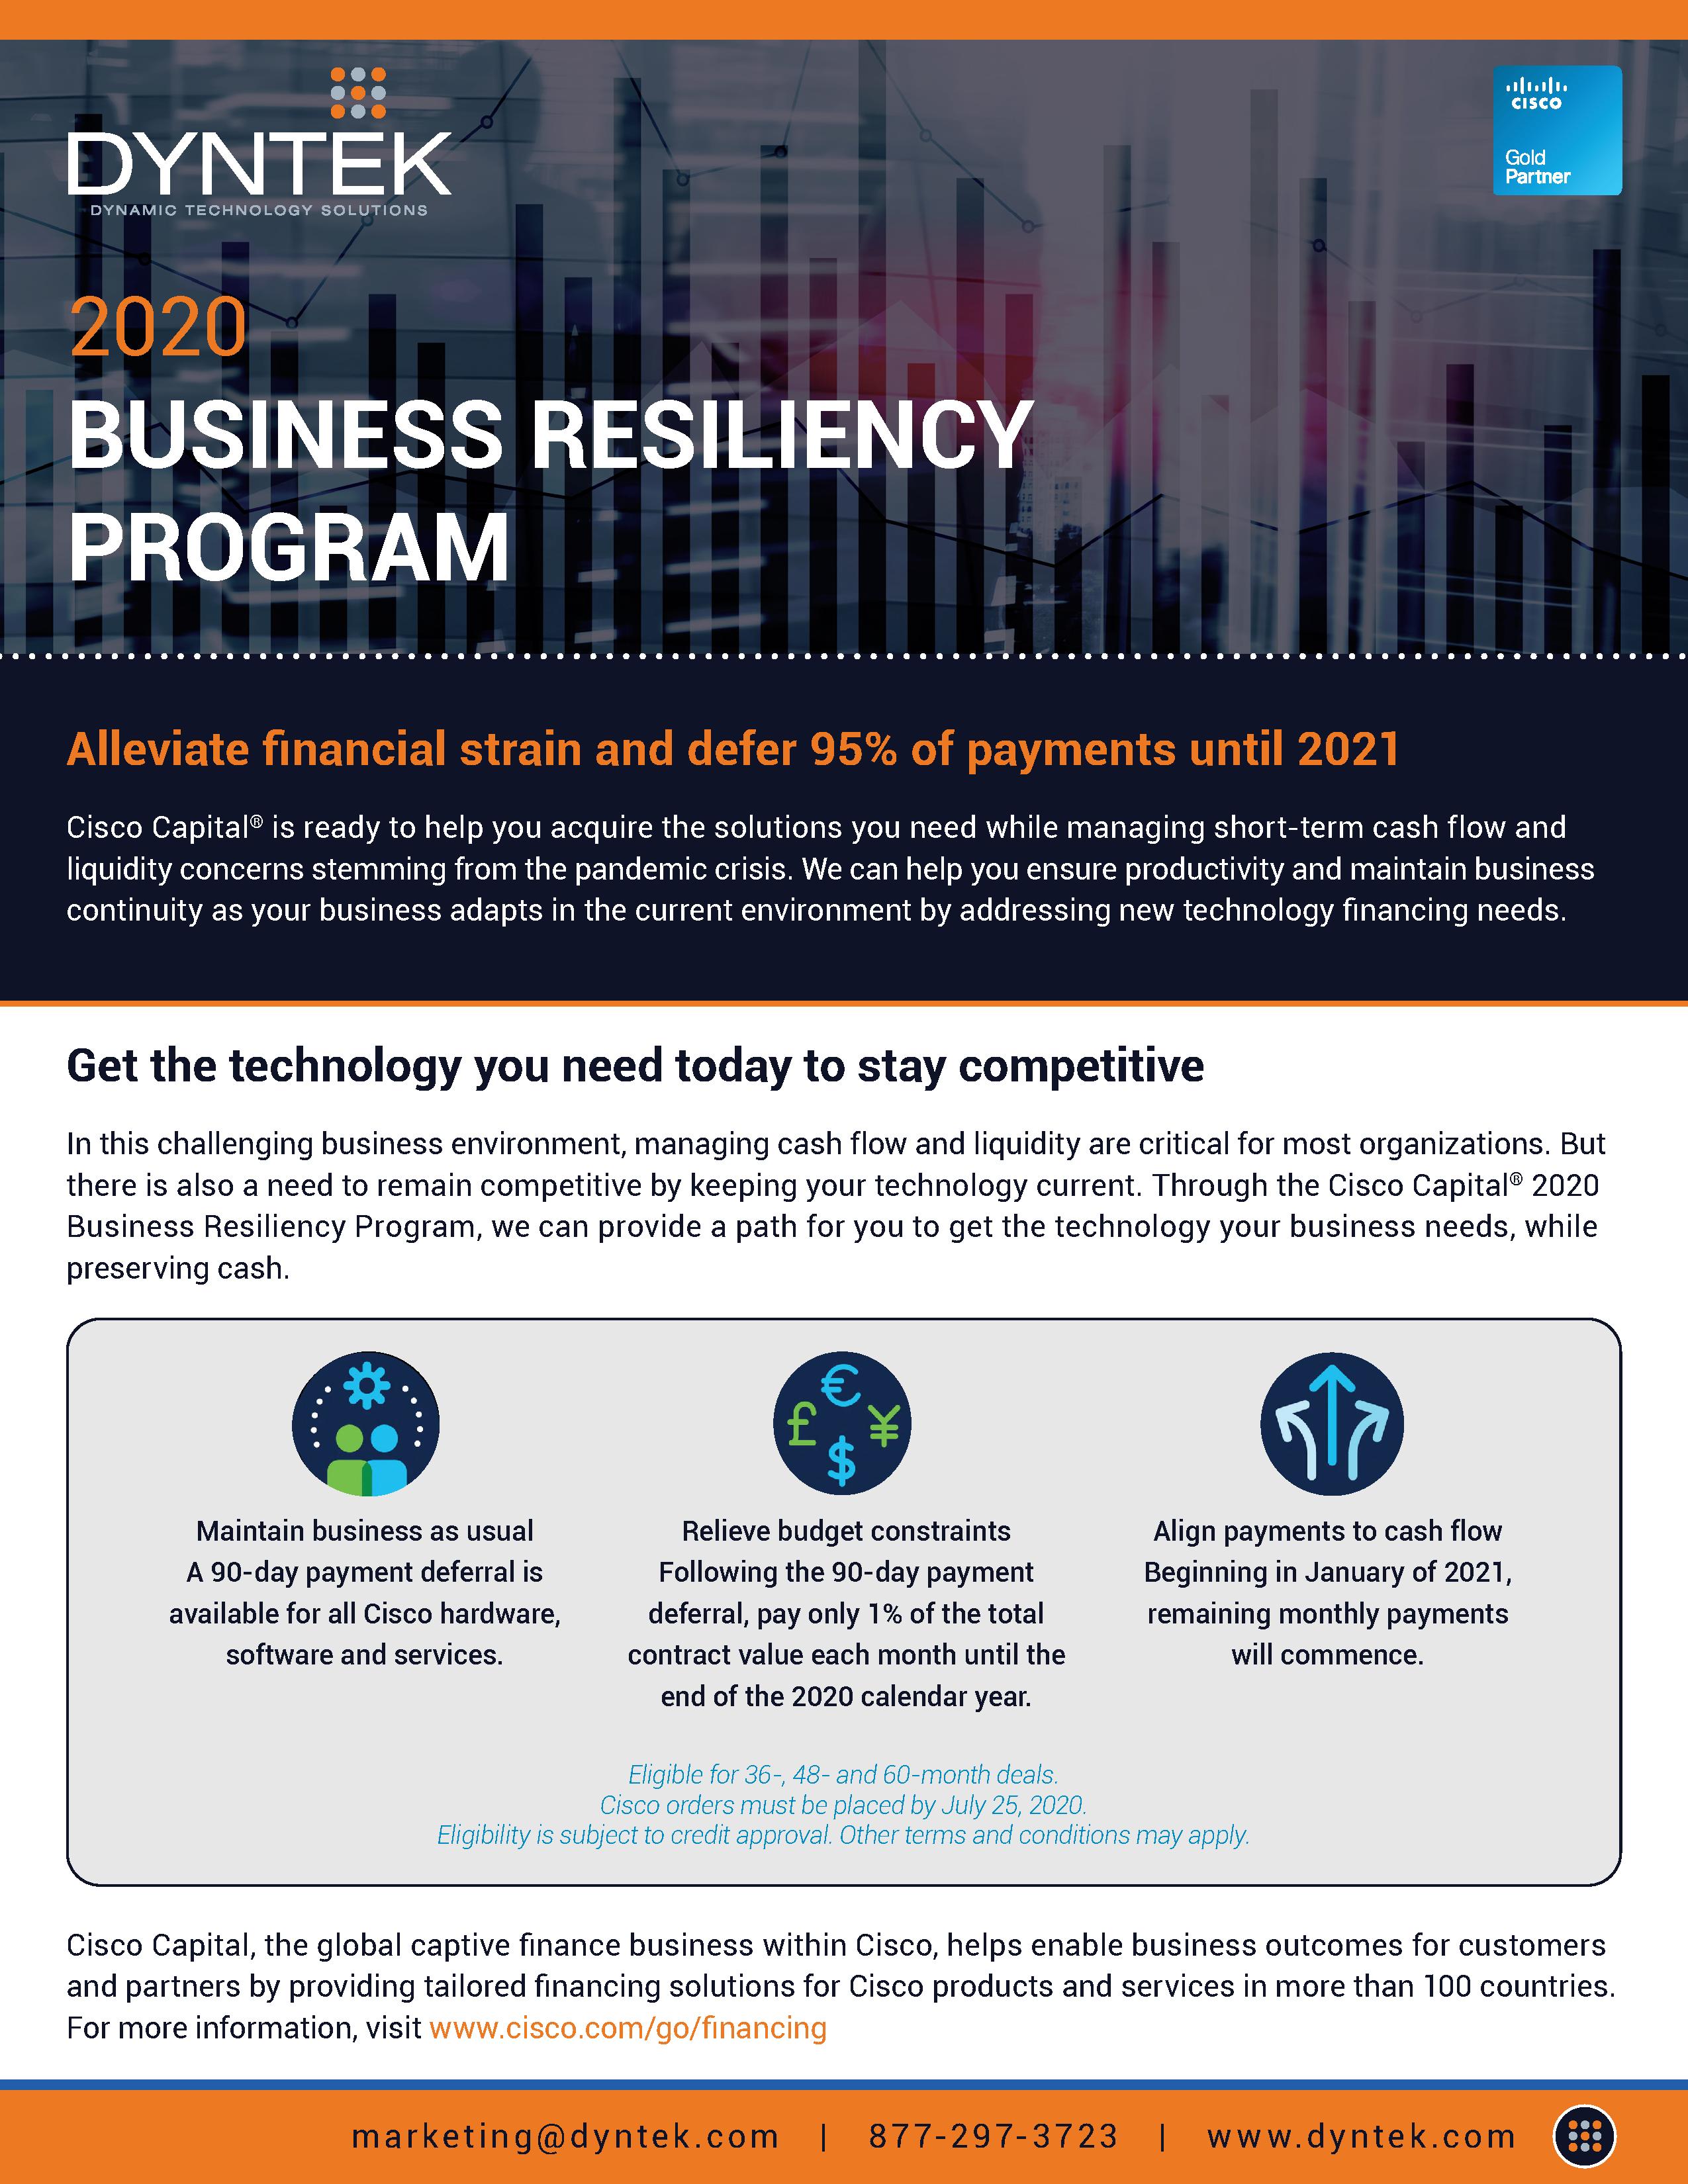 2020 Business Resiliency Program_DynTek_final_Page_1